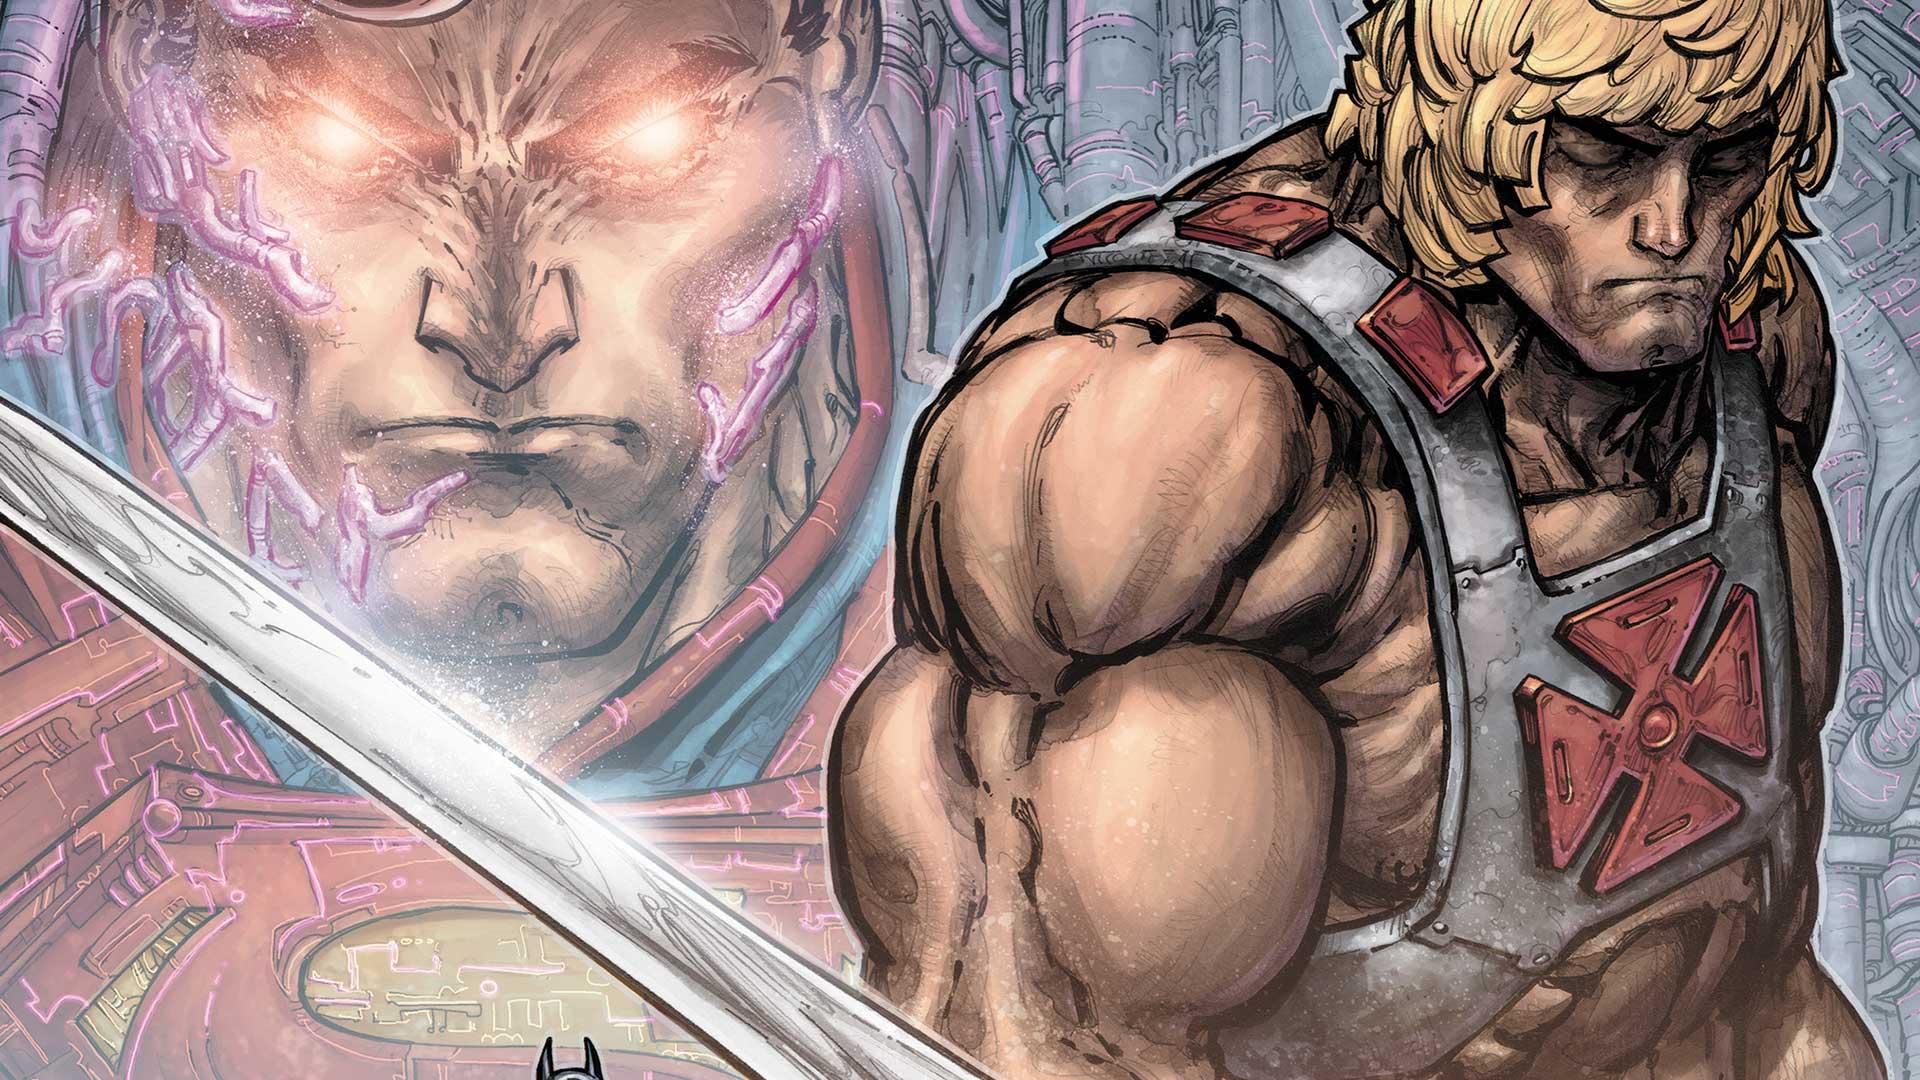 Injustice vs. Masters of the Universe #1 - DC Comics